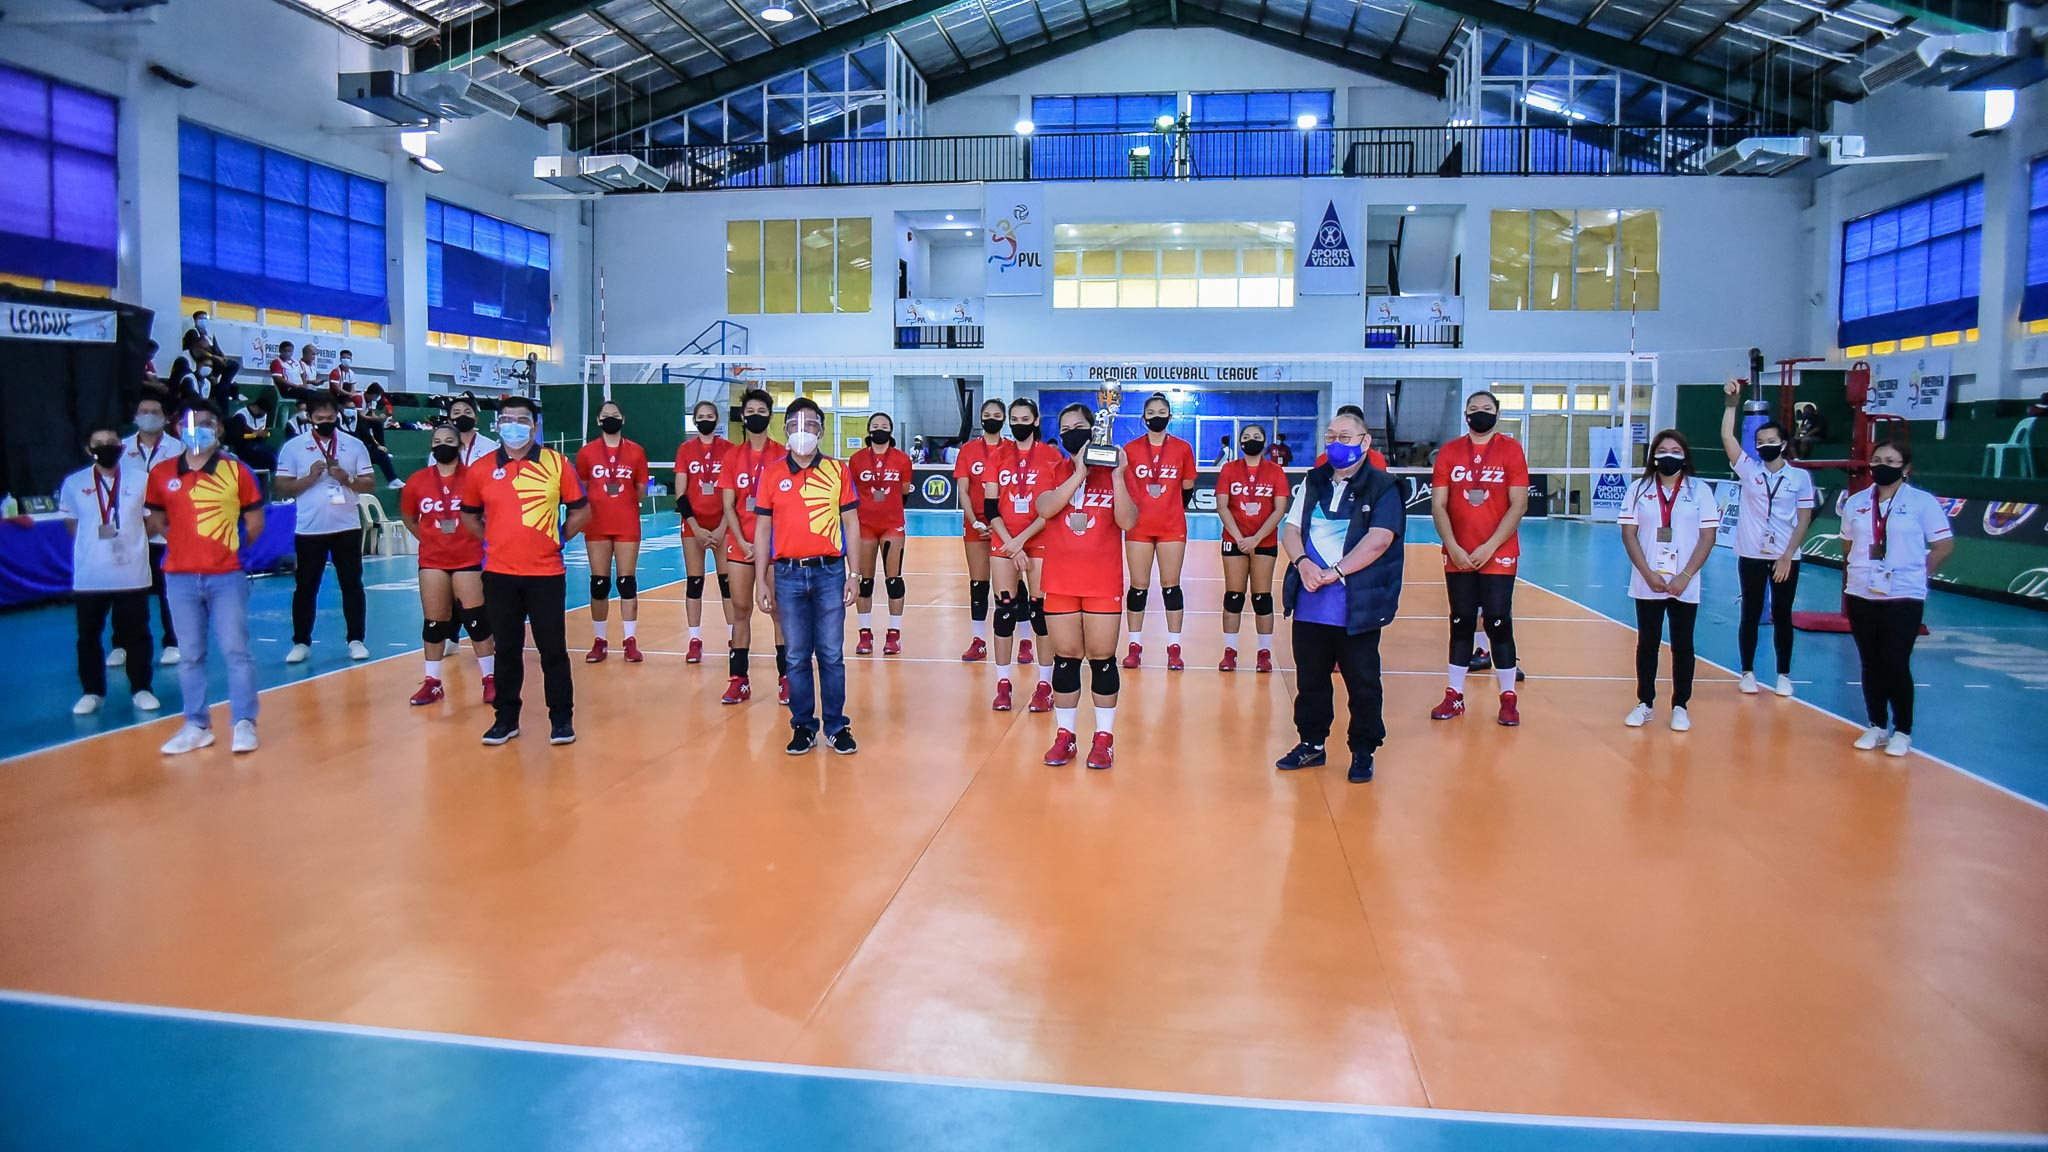 2021-PVL-Open-B03-G2-Petrogazz-vs.-Choco-Mucho-Bronze-awarding-5811 Chery Tiggo, Creamline decline AVC Women's Club invitation News PVL Volleyball  - philippine sports news